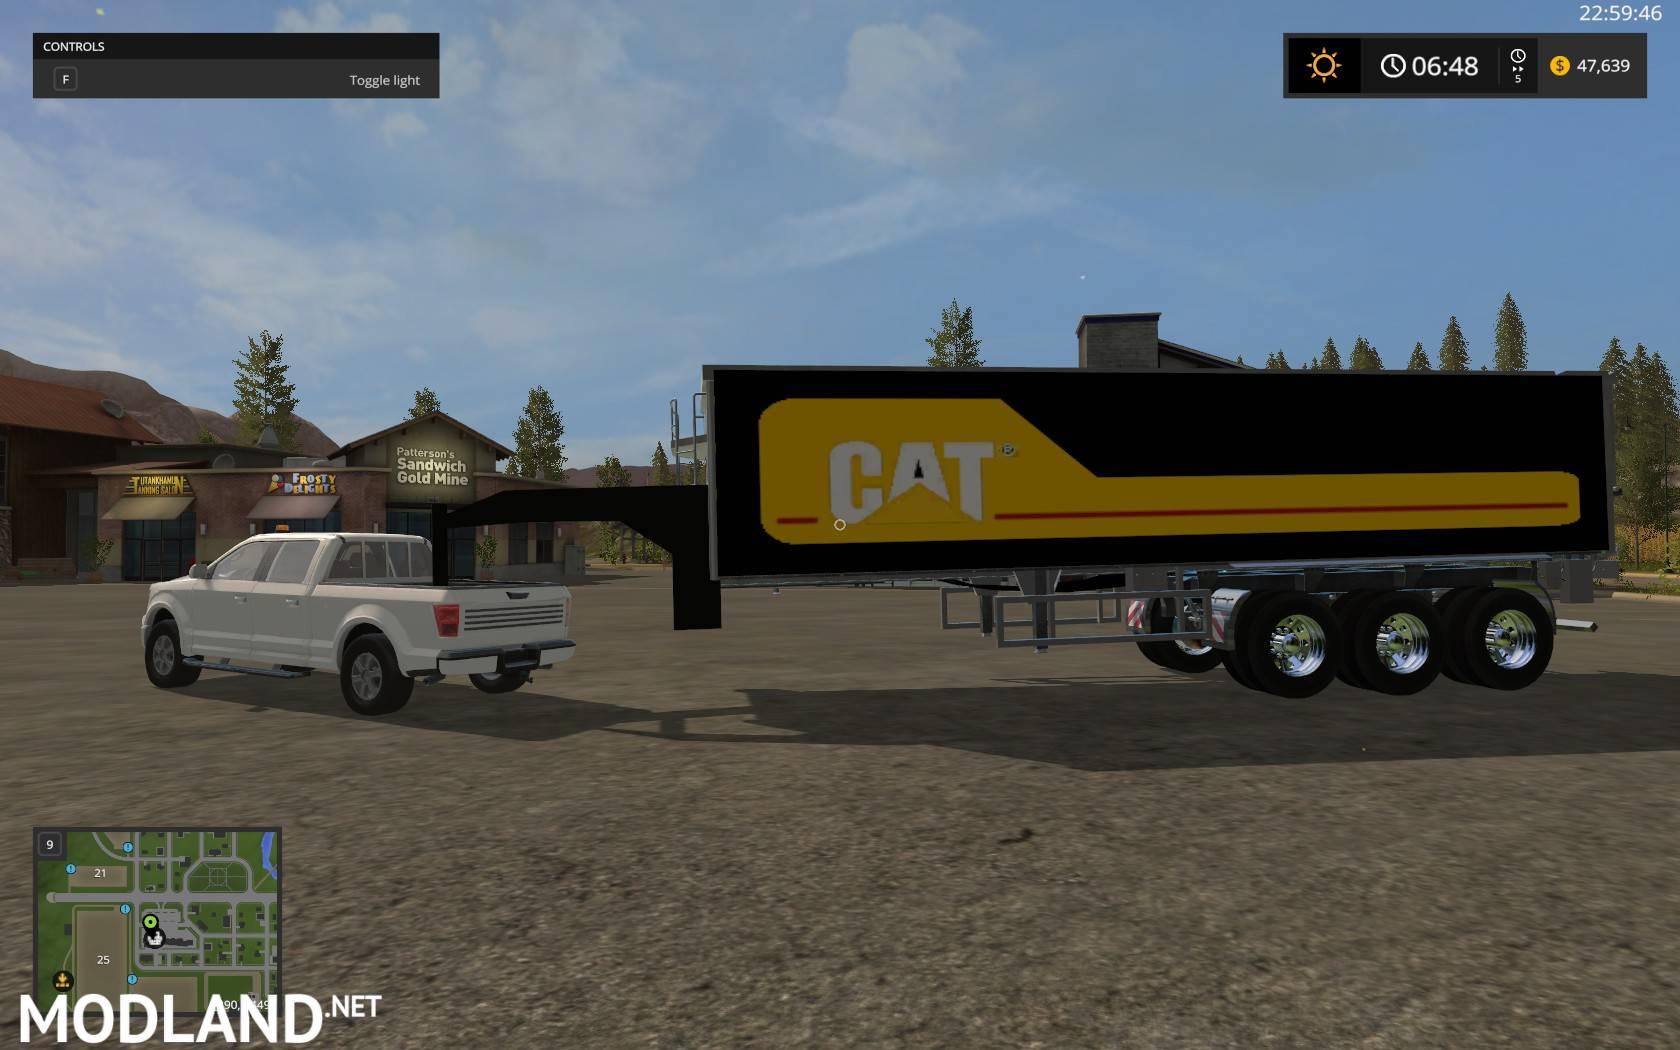 Cat Chrome Trailer Gooseneck Mod Farming Simulator 17